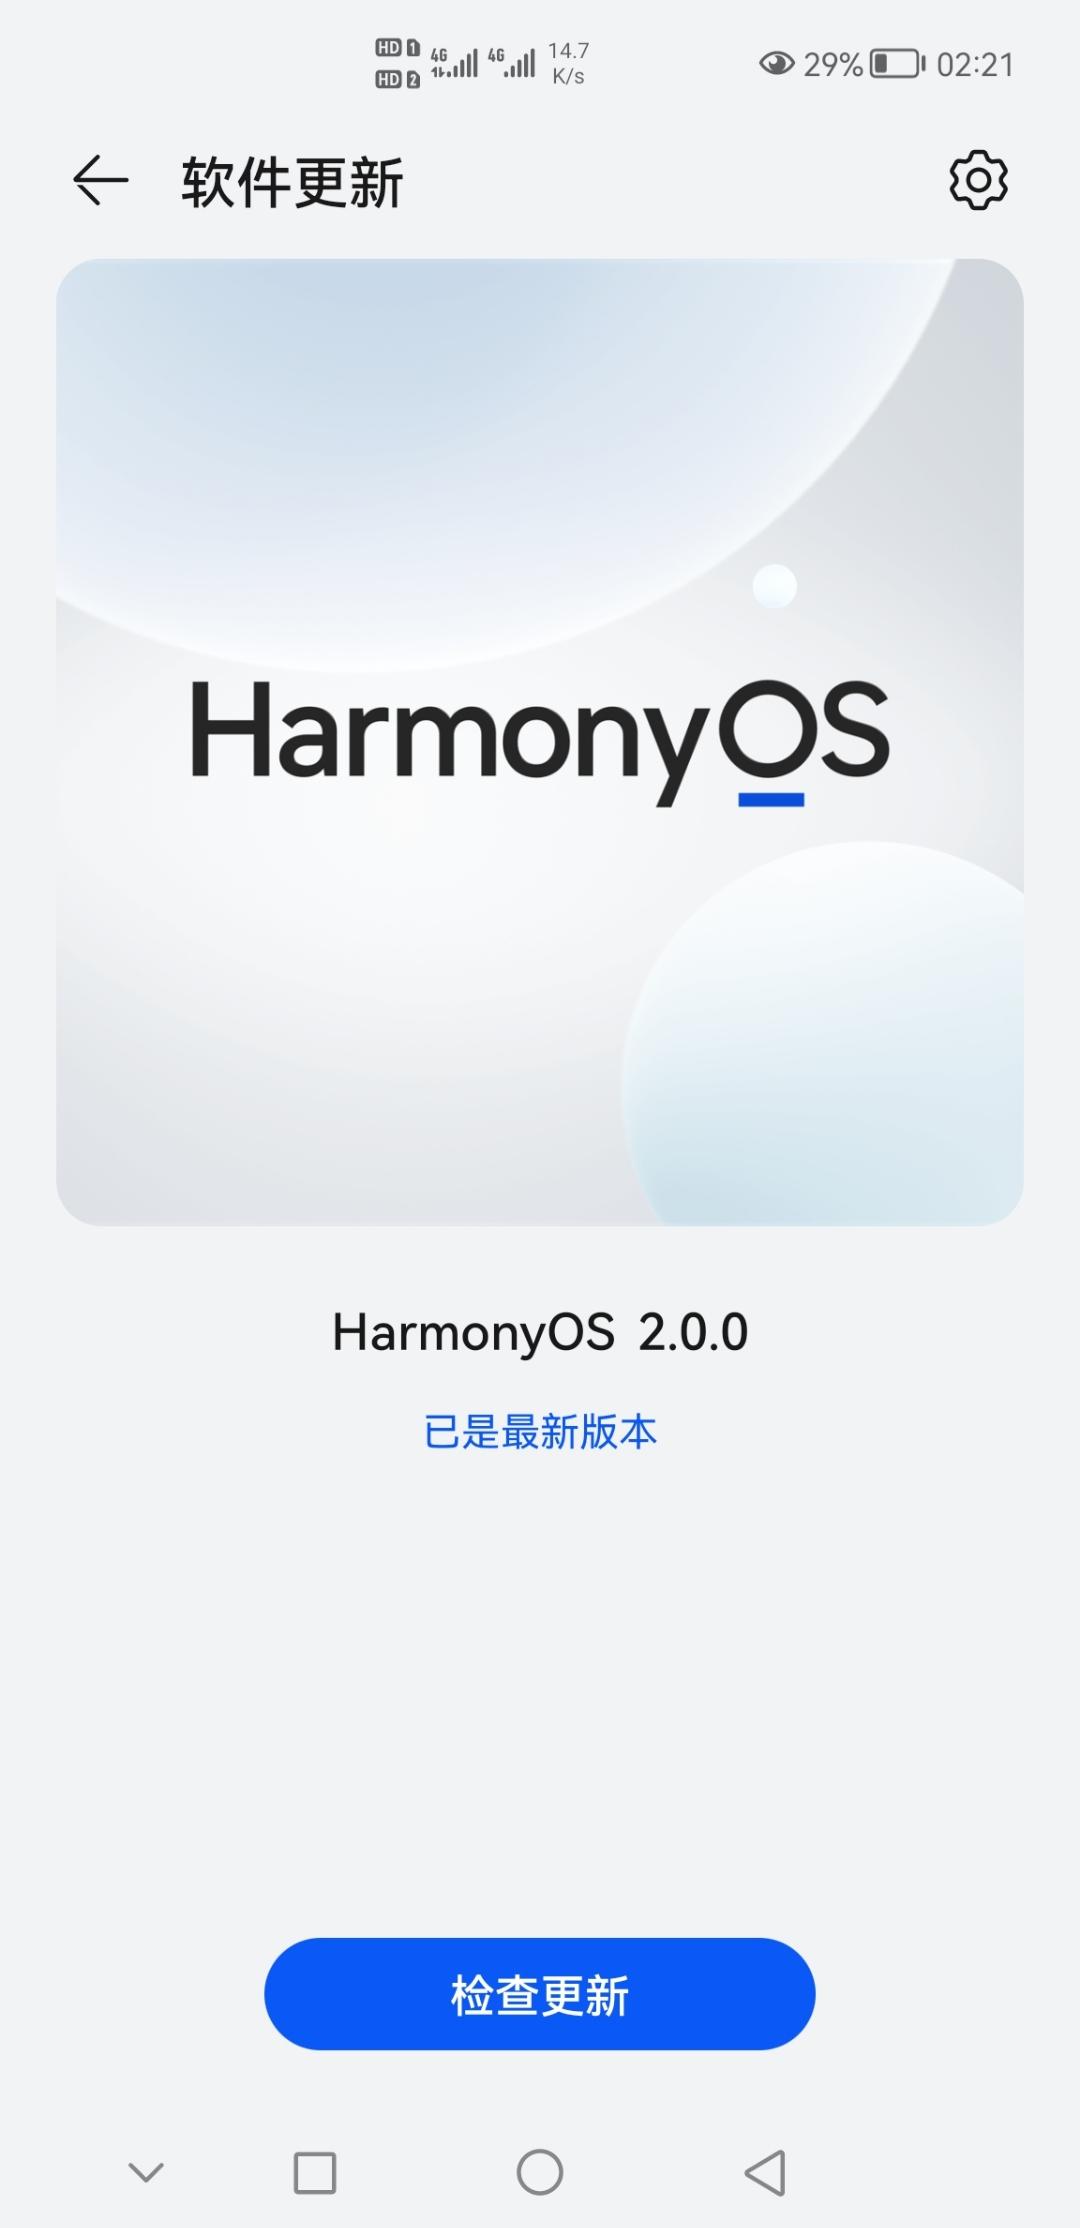 Screenshot_20211015_022130_com.huawei.android.hwouc.jpg